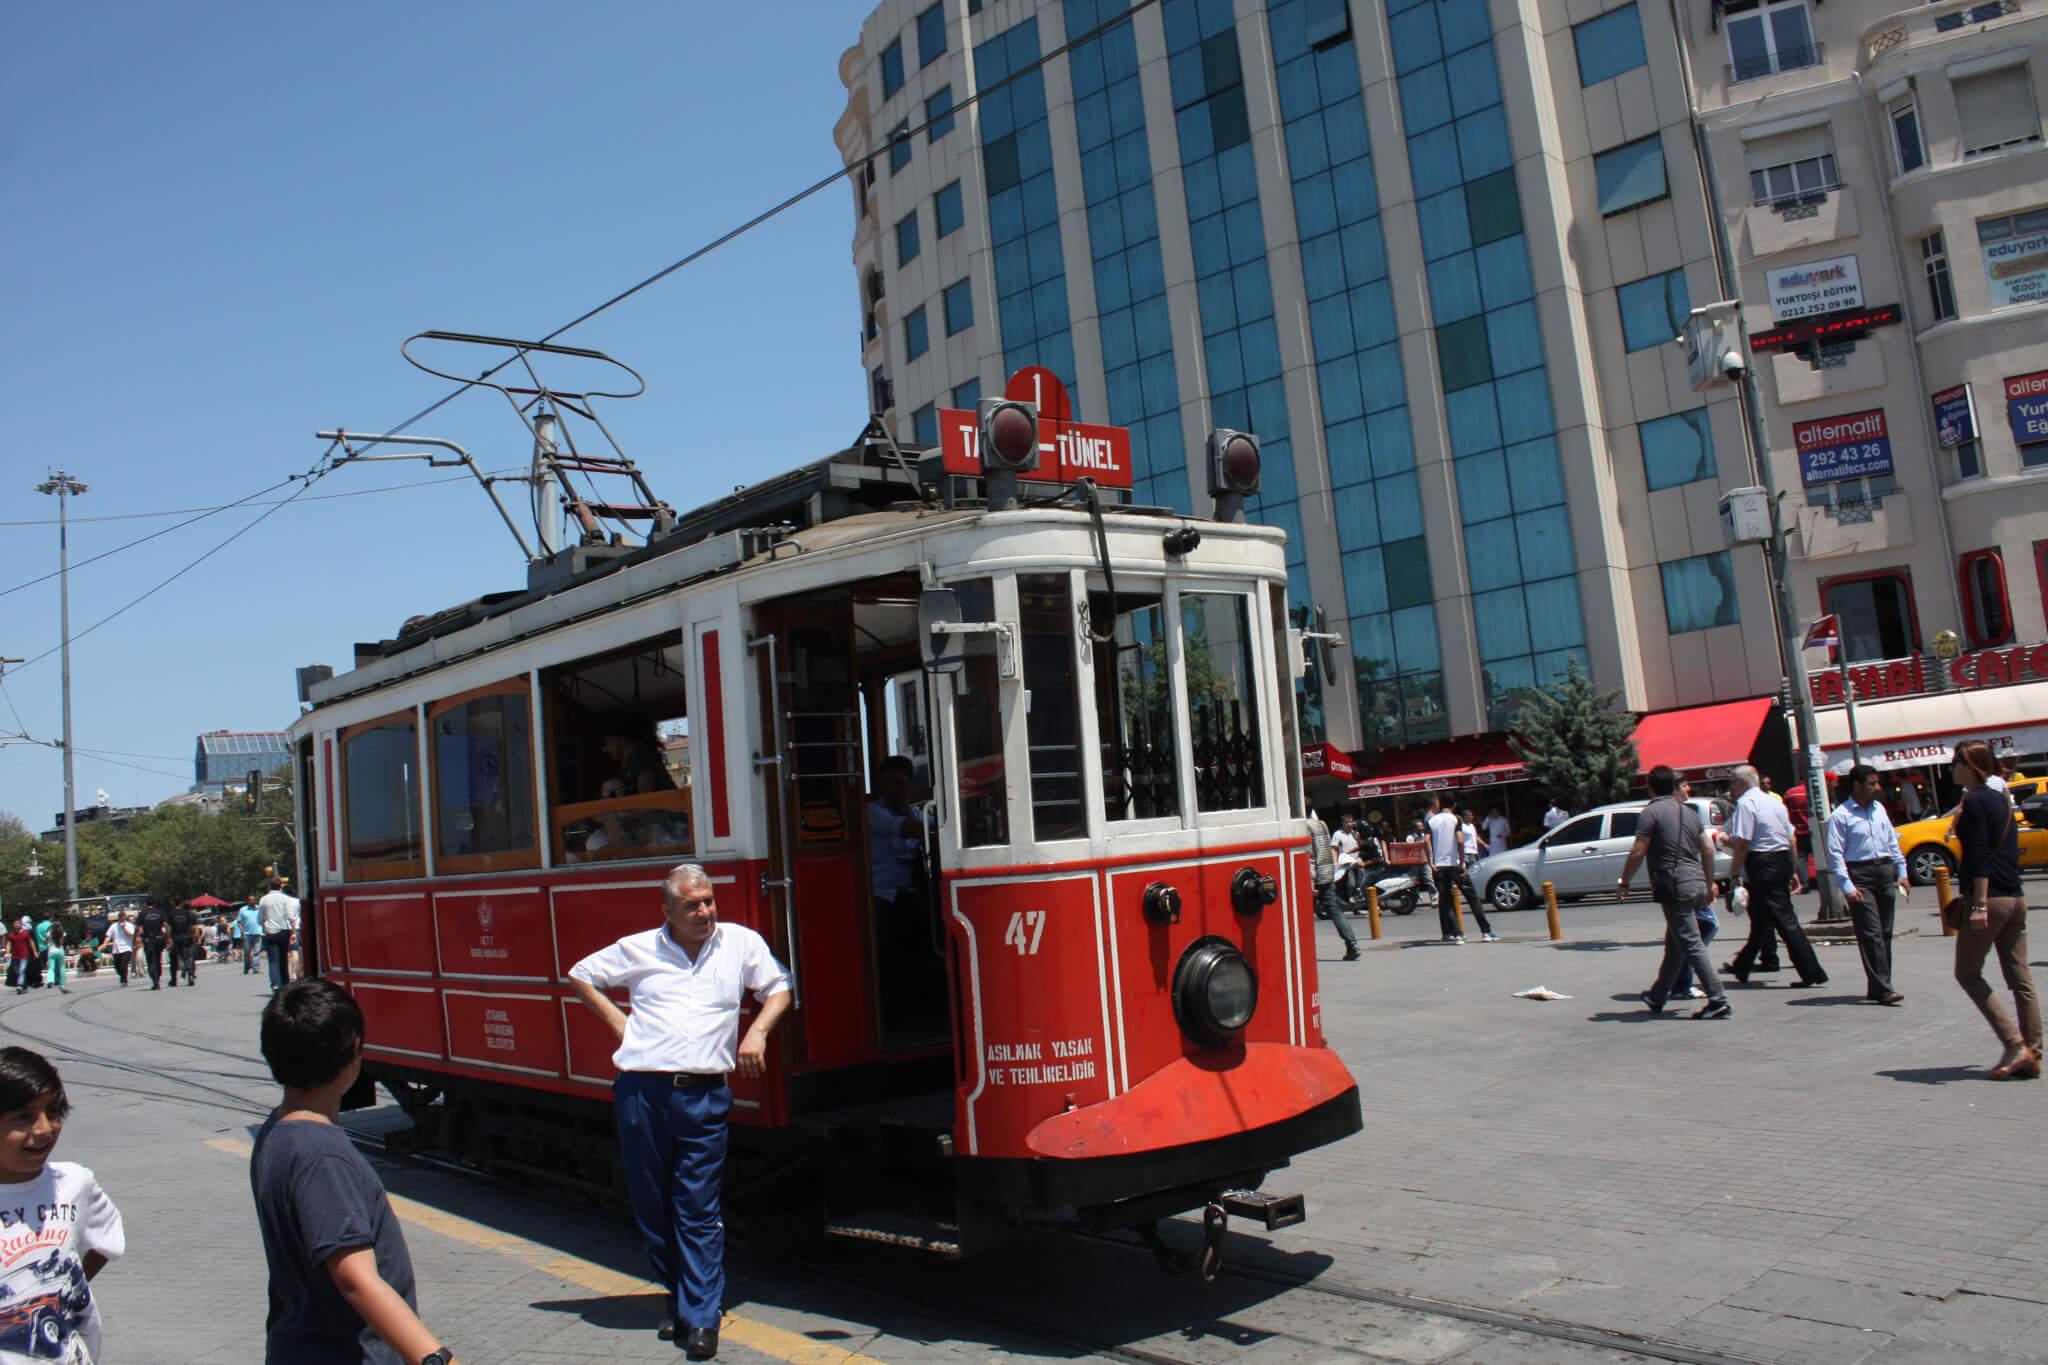 İstiklal Caddesi, Istanbul